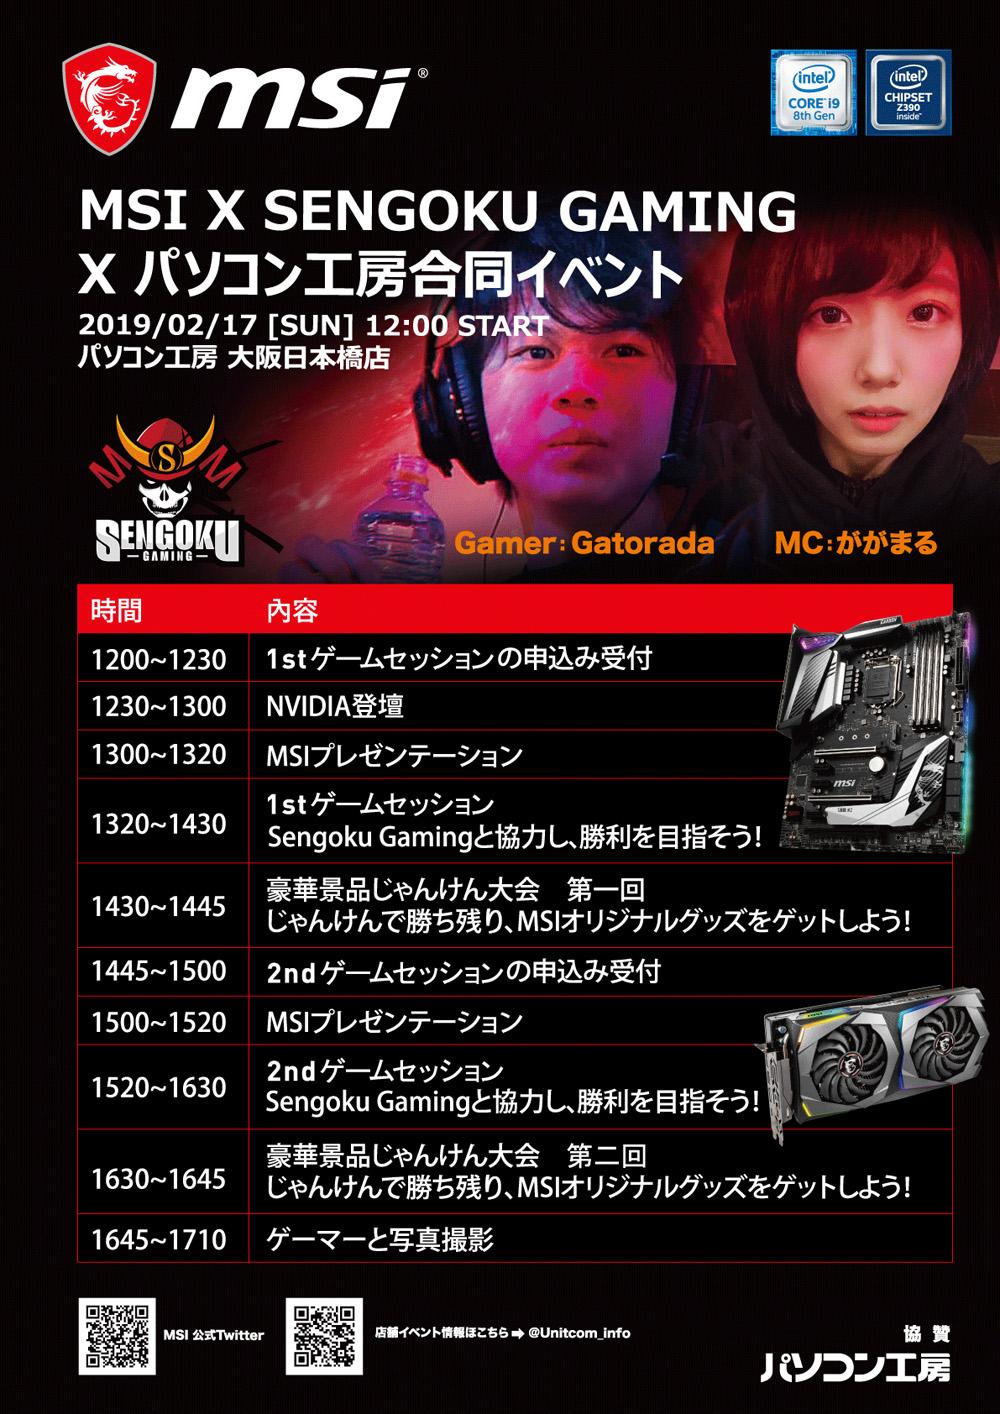 MSI、Sengoku GamingとのR6S対戦イベントを</br> 2月〜6月にかけてパソコン工房店舗にて開催